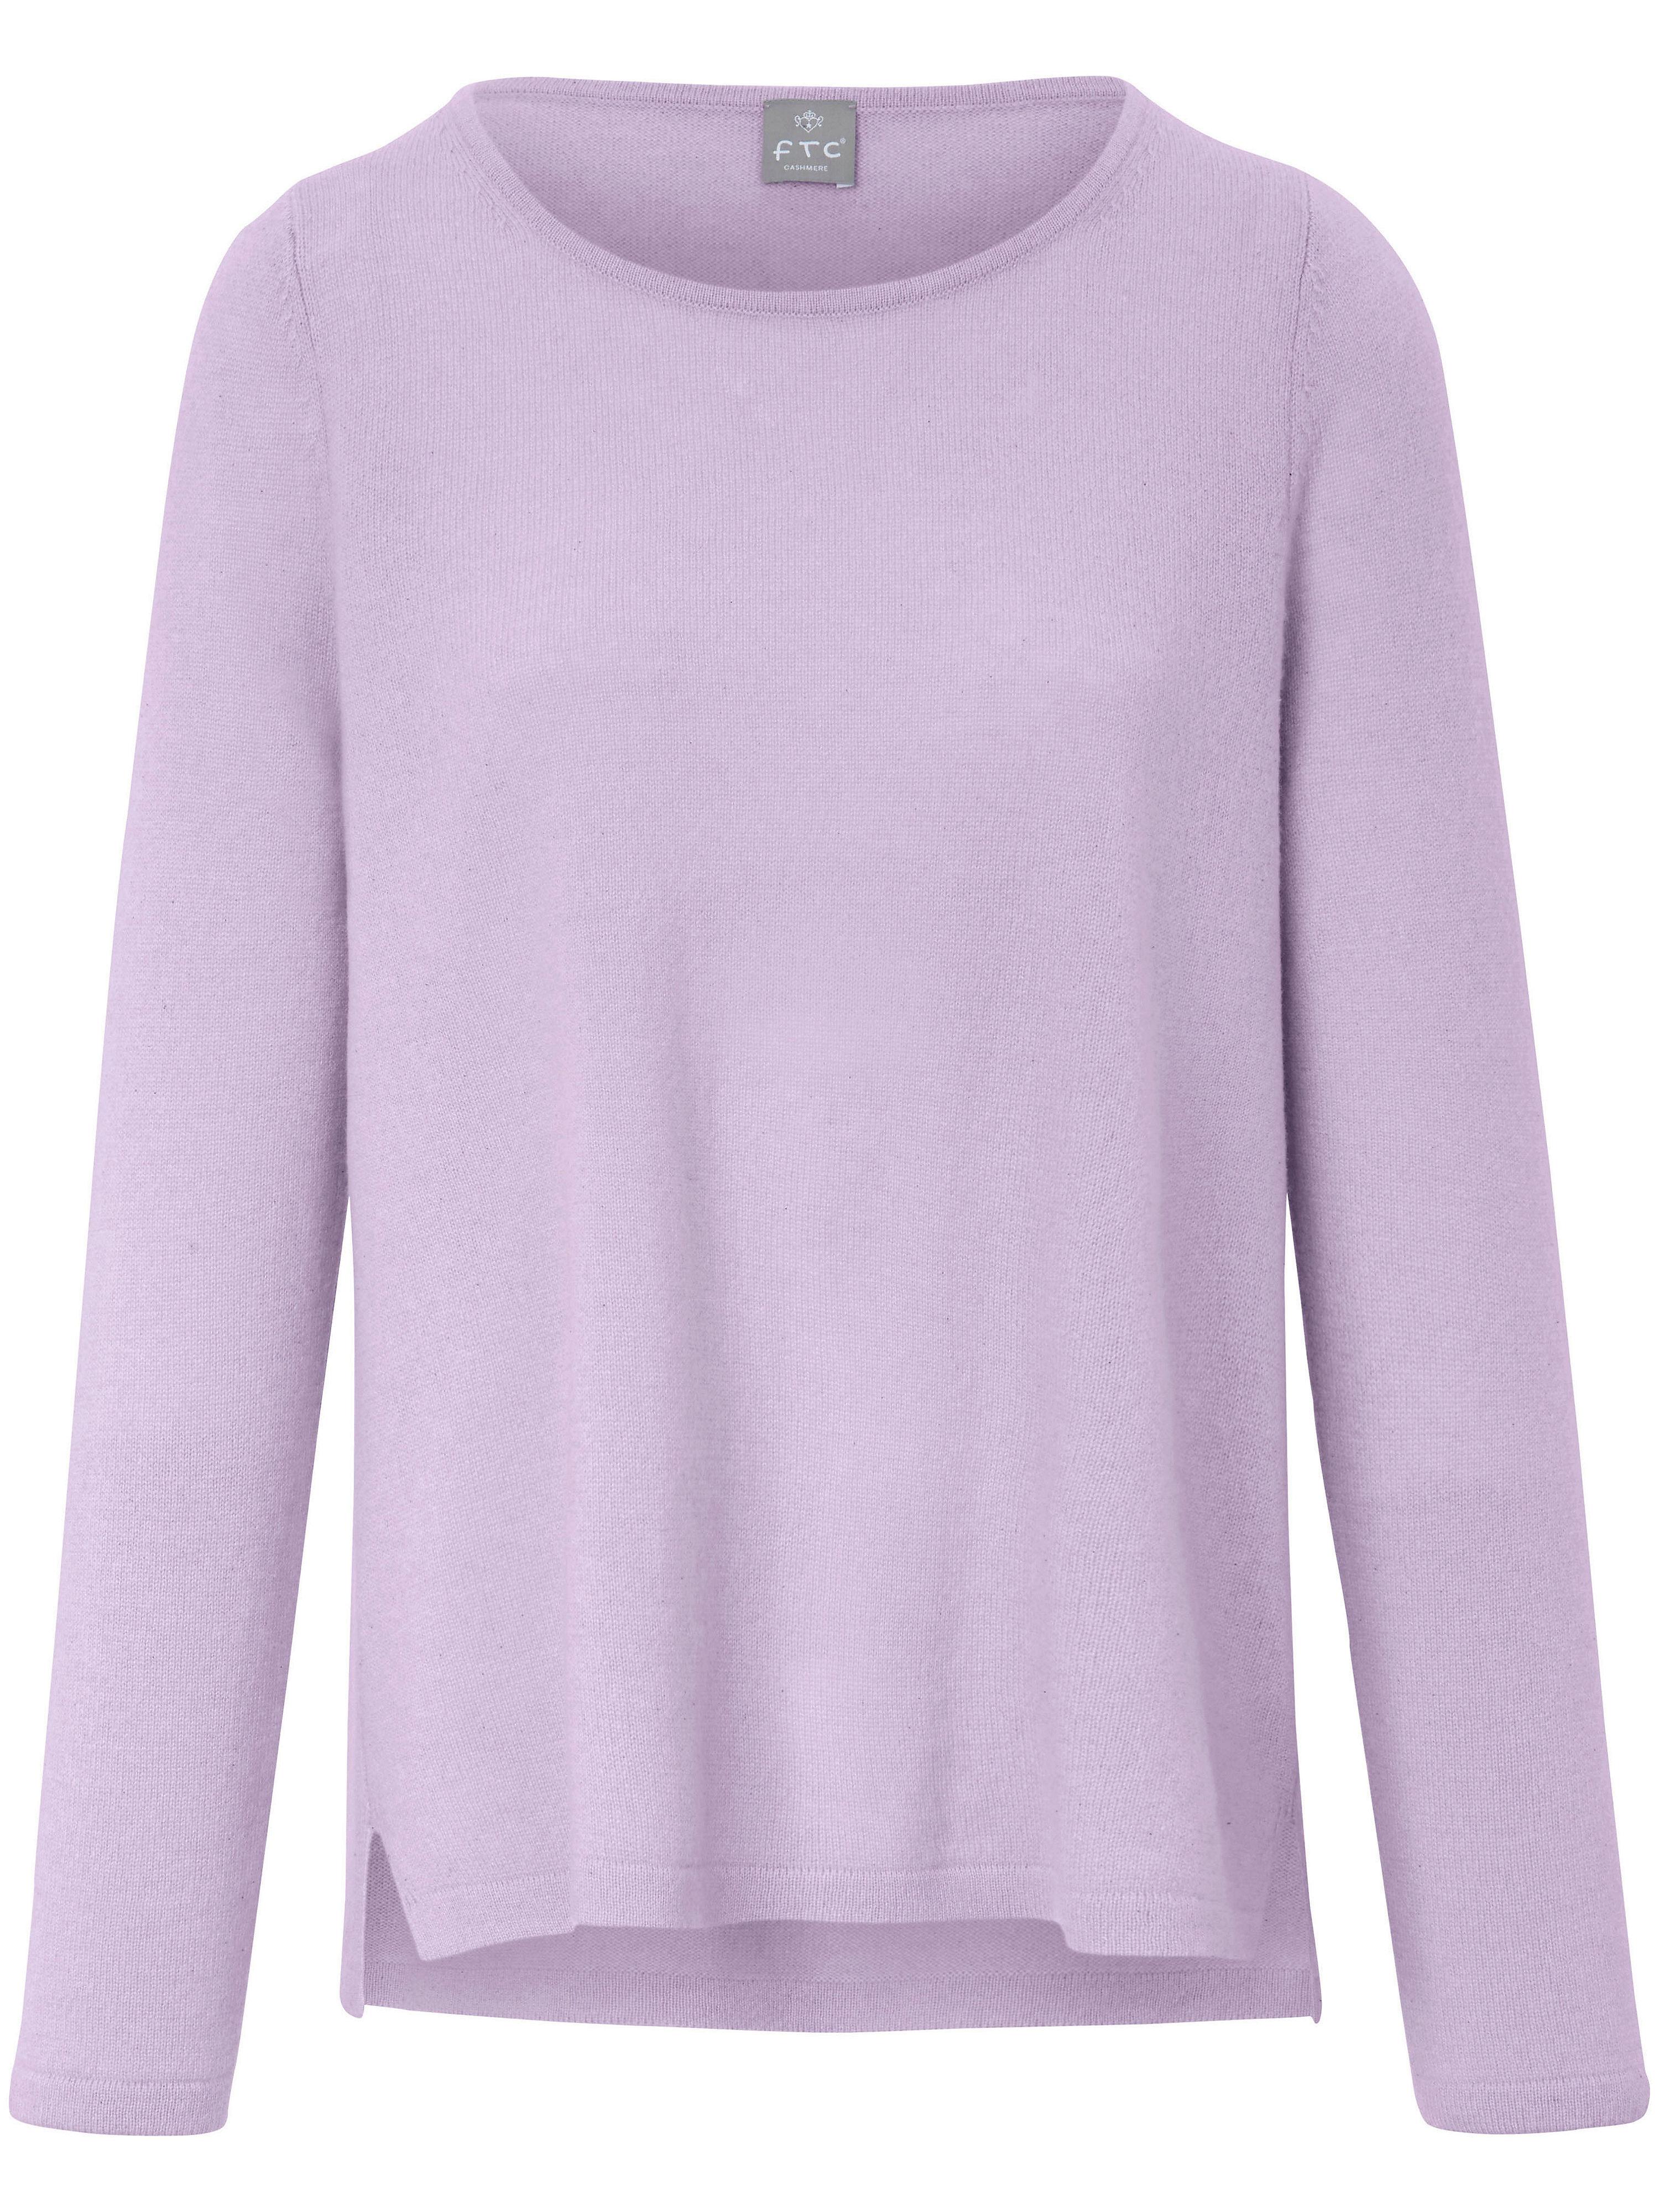 FTC Cashmere Rundhalsad tröja i 100% kashmir från FTC Cashmere lila